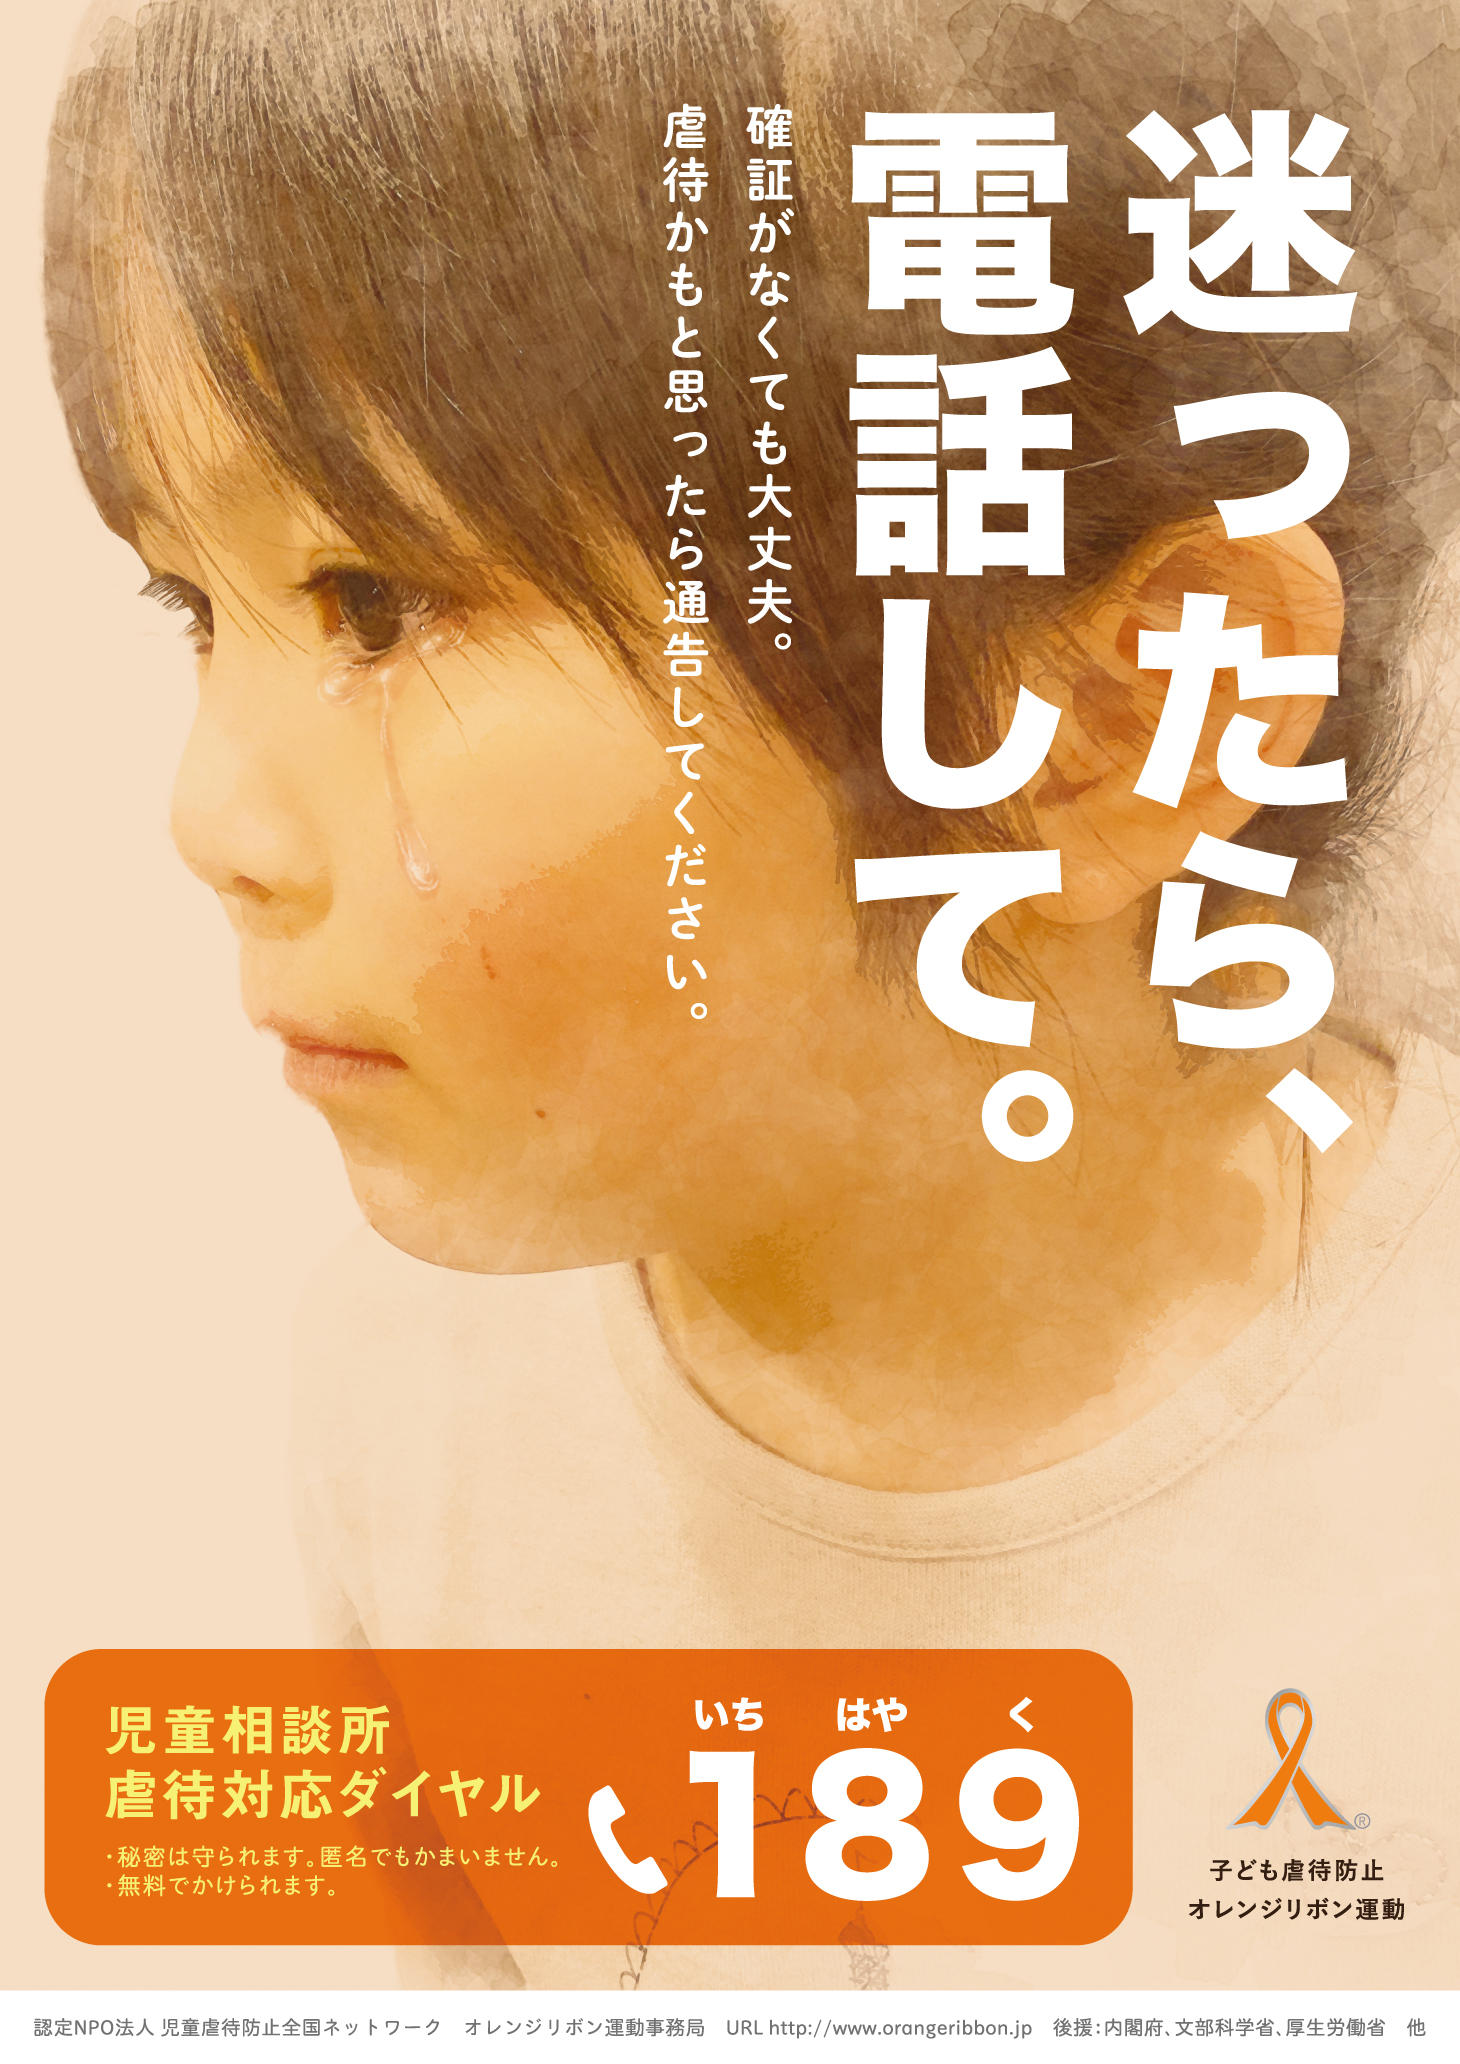 http://www.orangeribbon.jp/info/npo/607359cae23e85c1da56e5a0cd460f848e36671f.jpg